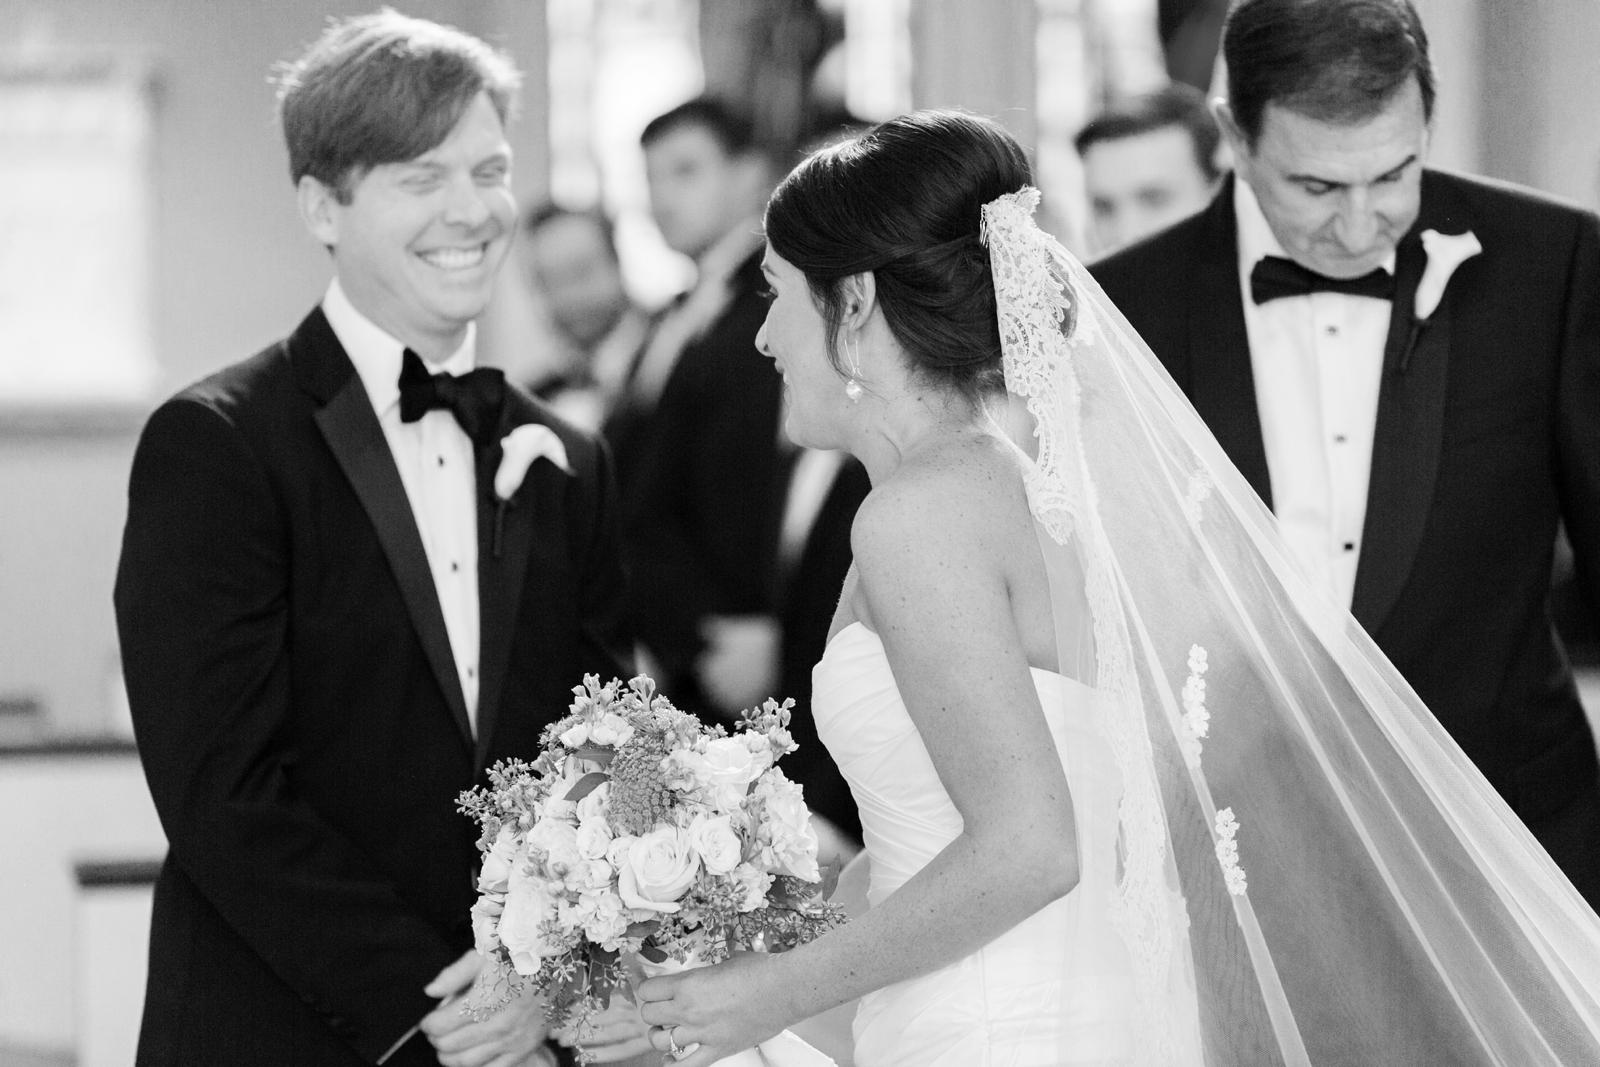 atrium at curtis center wedding photographer philadelphia wedding photographer shannon griffin_0006.jpg